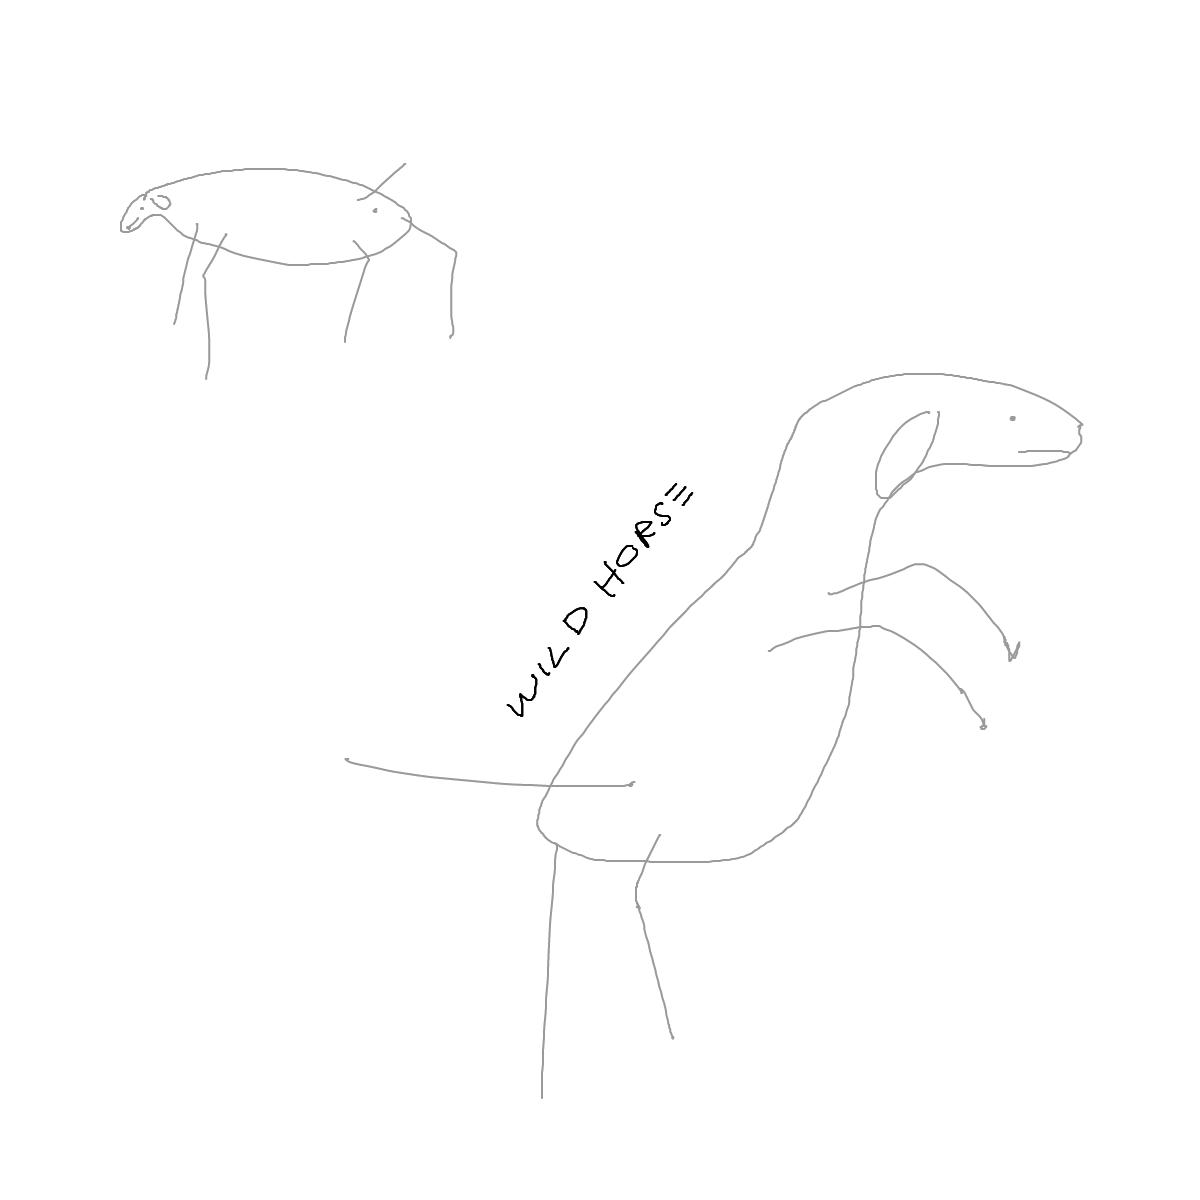 BAAAM drawing#2134 lat:52.4750404357910160lng: 13.4068031311035160